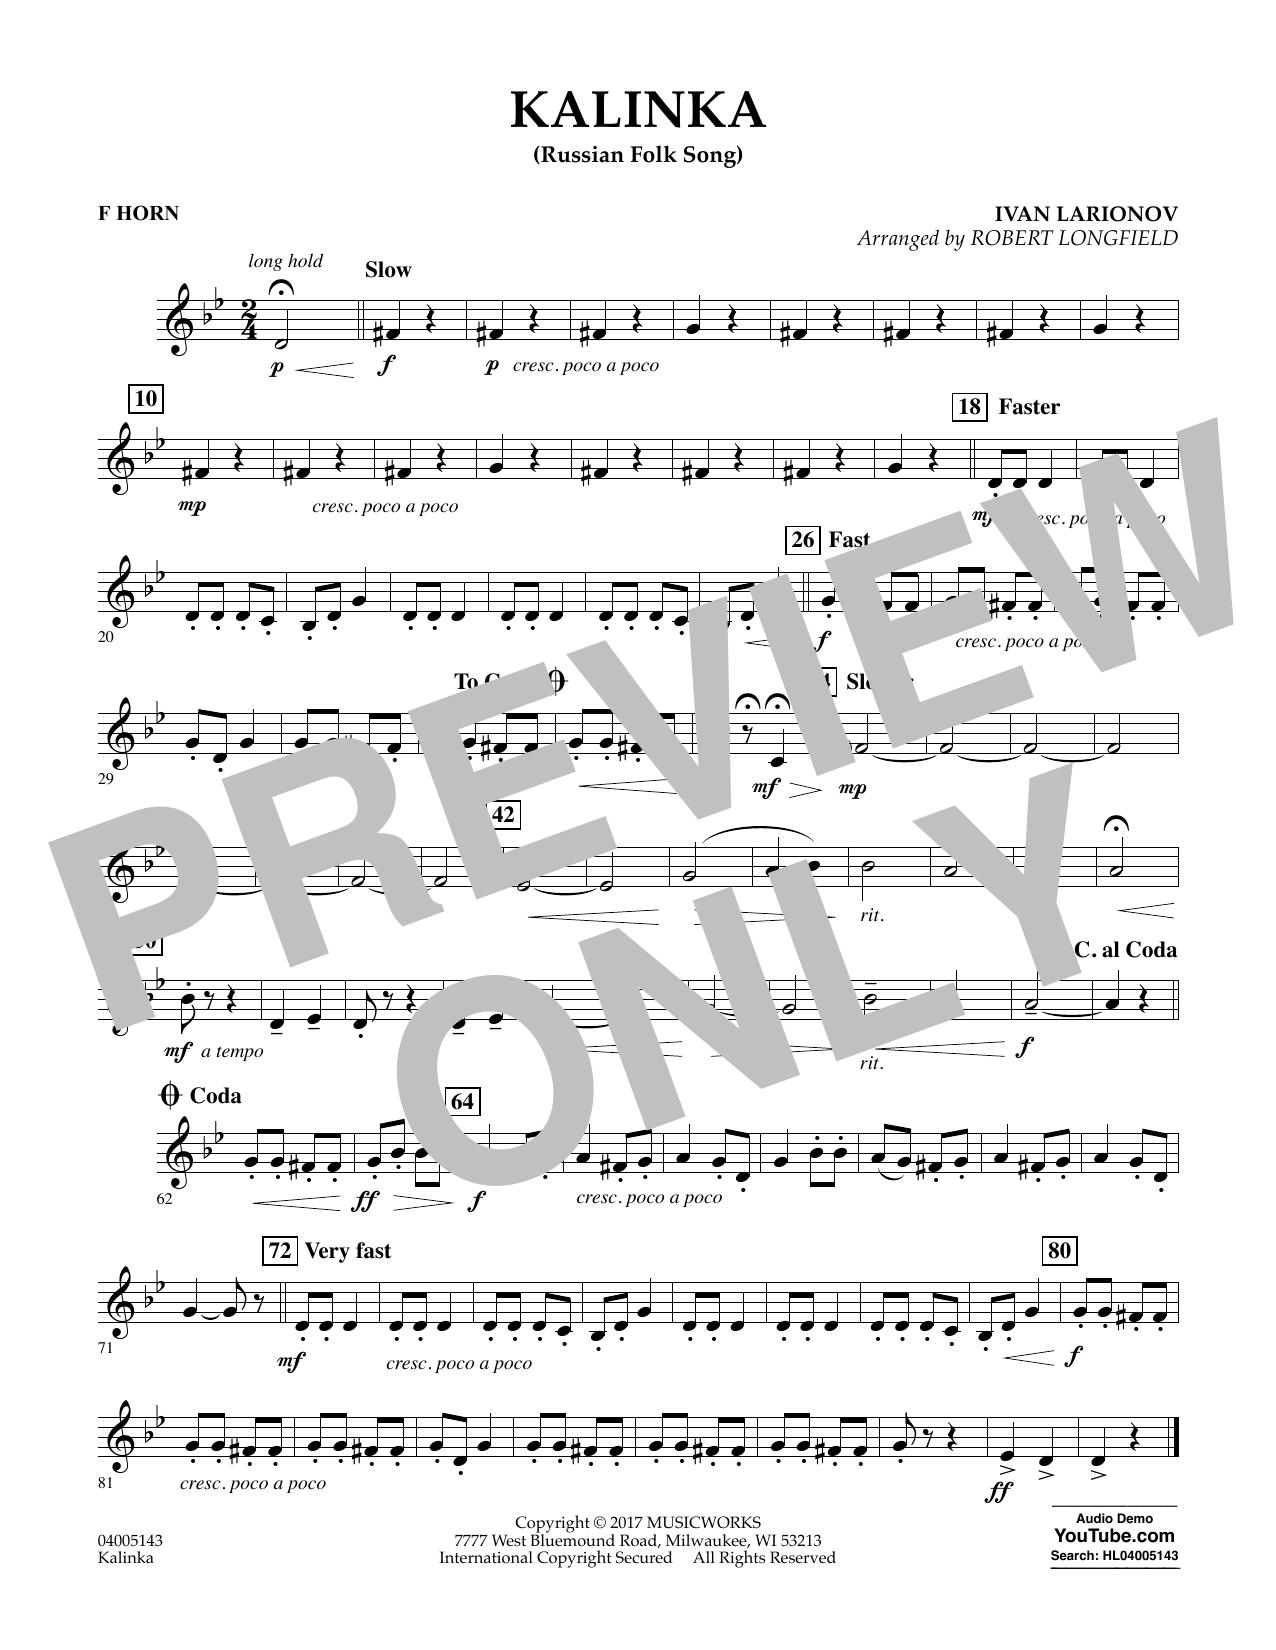 Robert Longfield Kalinka (Russian Folk Song) - F Horn sheet music notes and chords. Download Printable PDF.